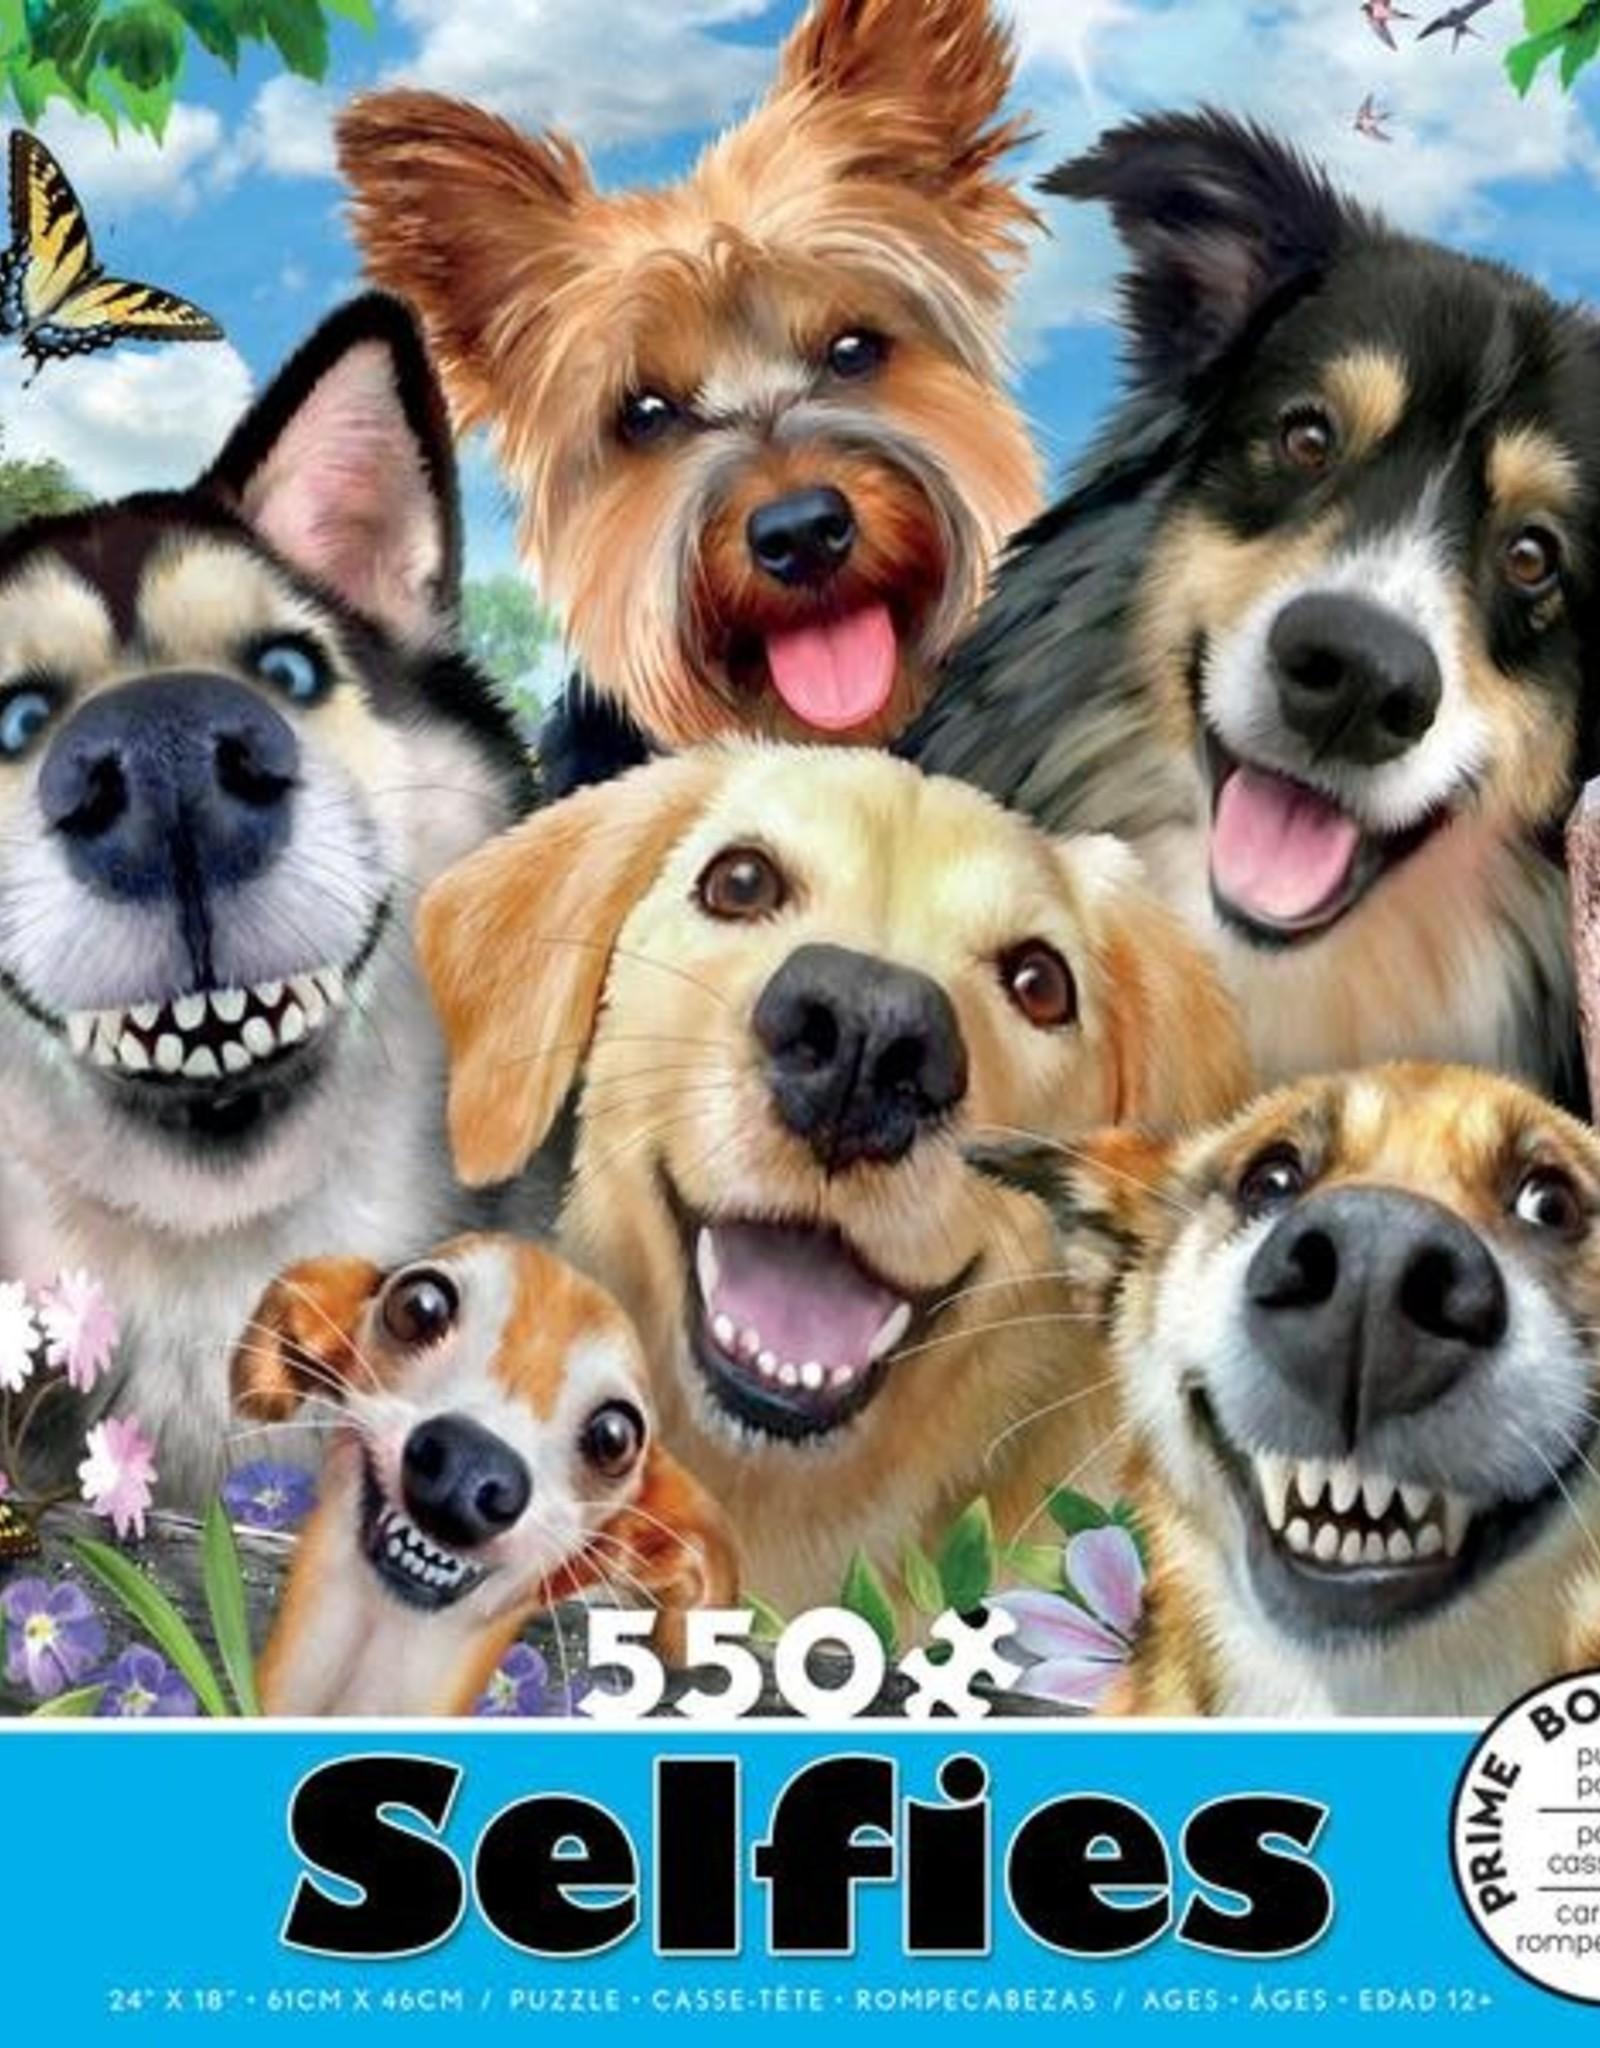 CEACO 550 pc puzzle - Selfies - Dog Delight